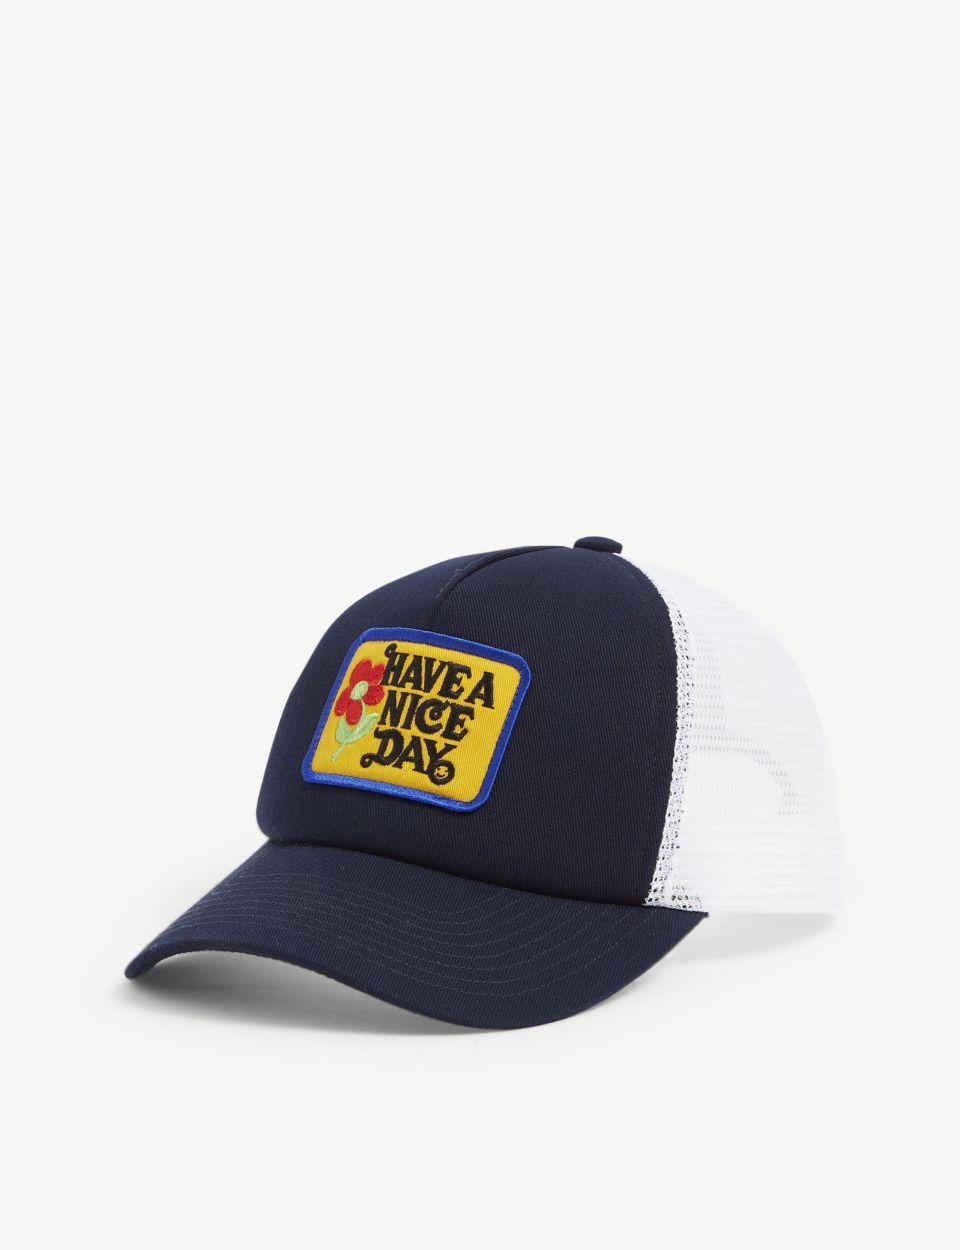 Nice day cotton baseball cap